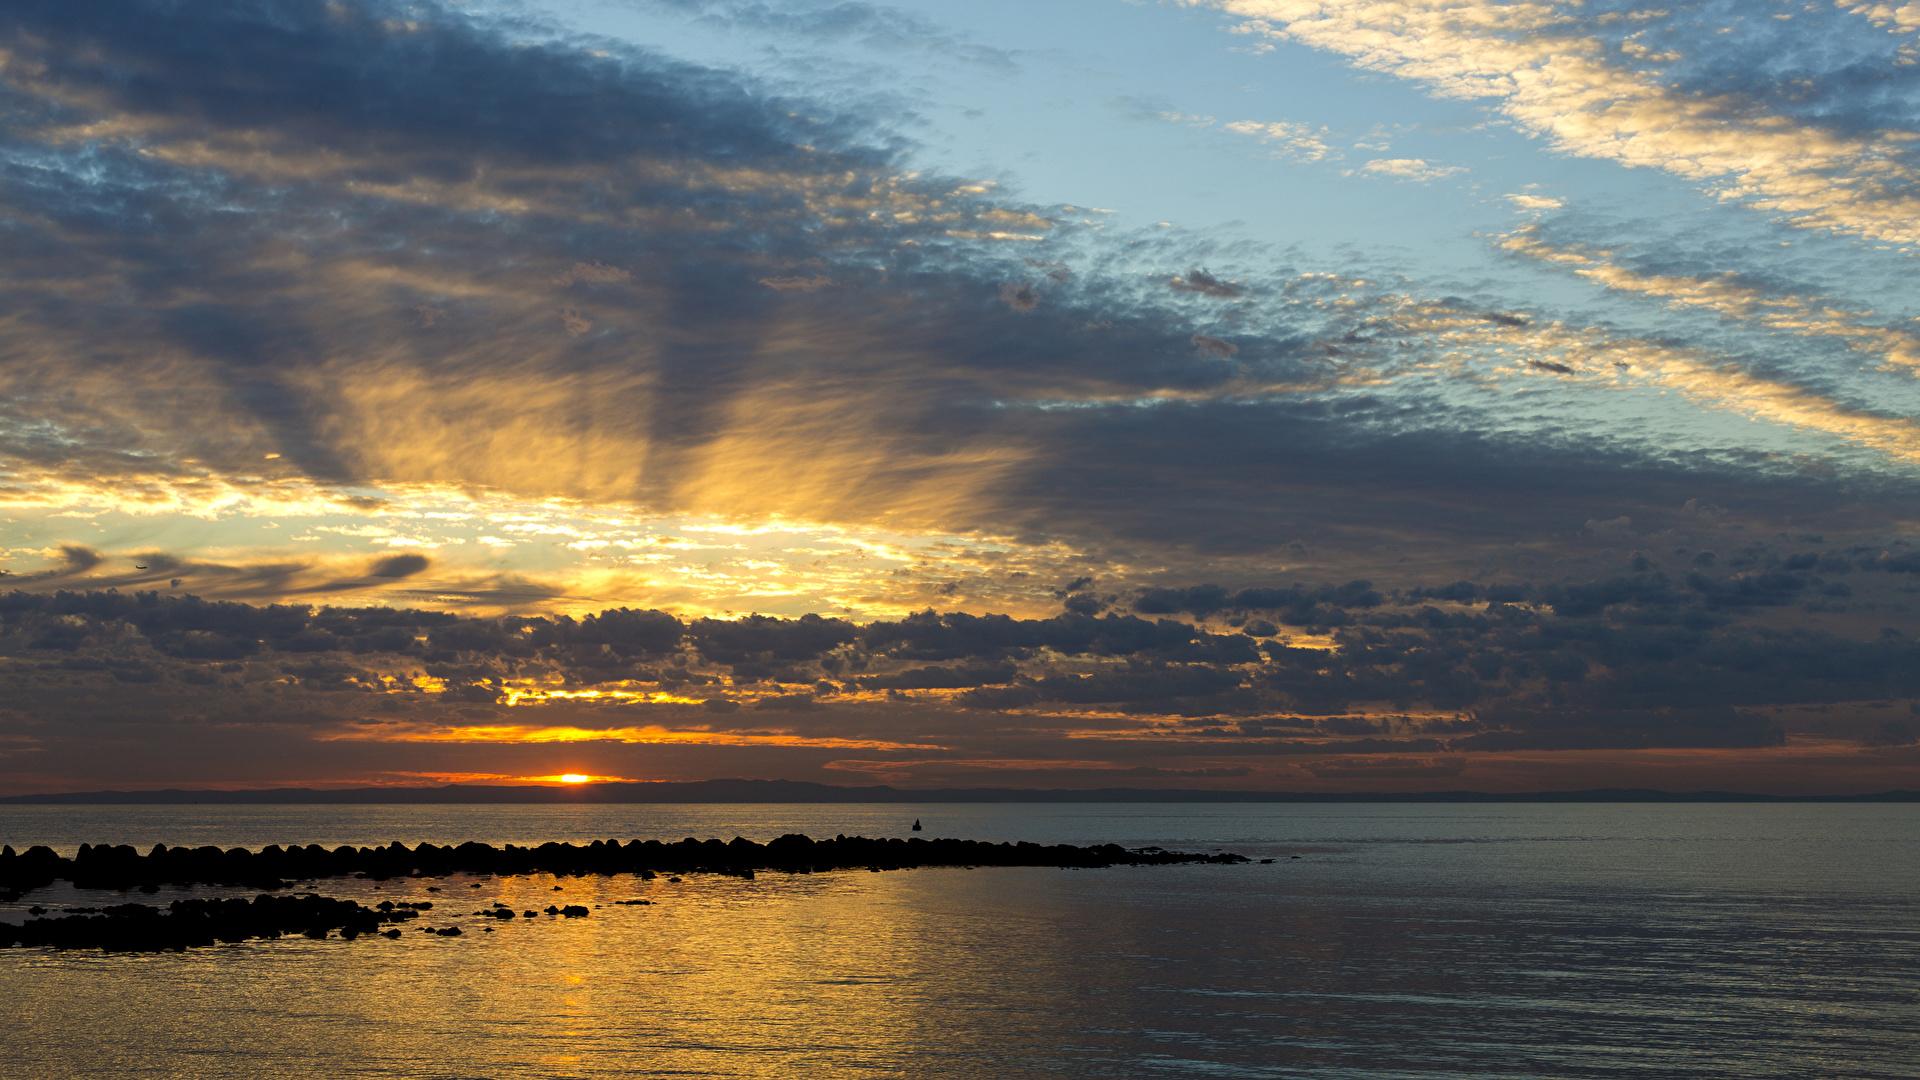 Фото Австралия Queensland Море Природа Небо рассвет и закат облачно 1920x1080 Рассветы и закаты облако Облака